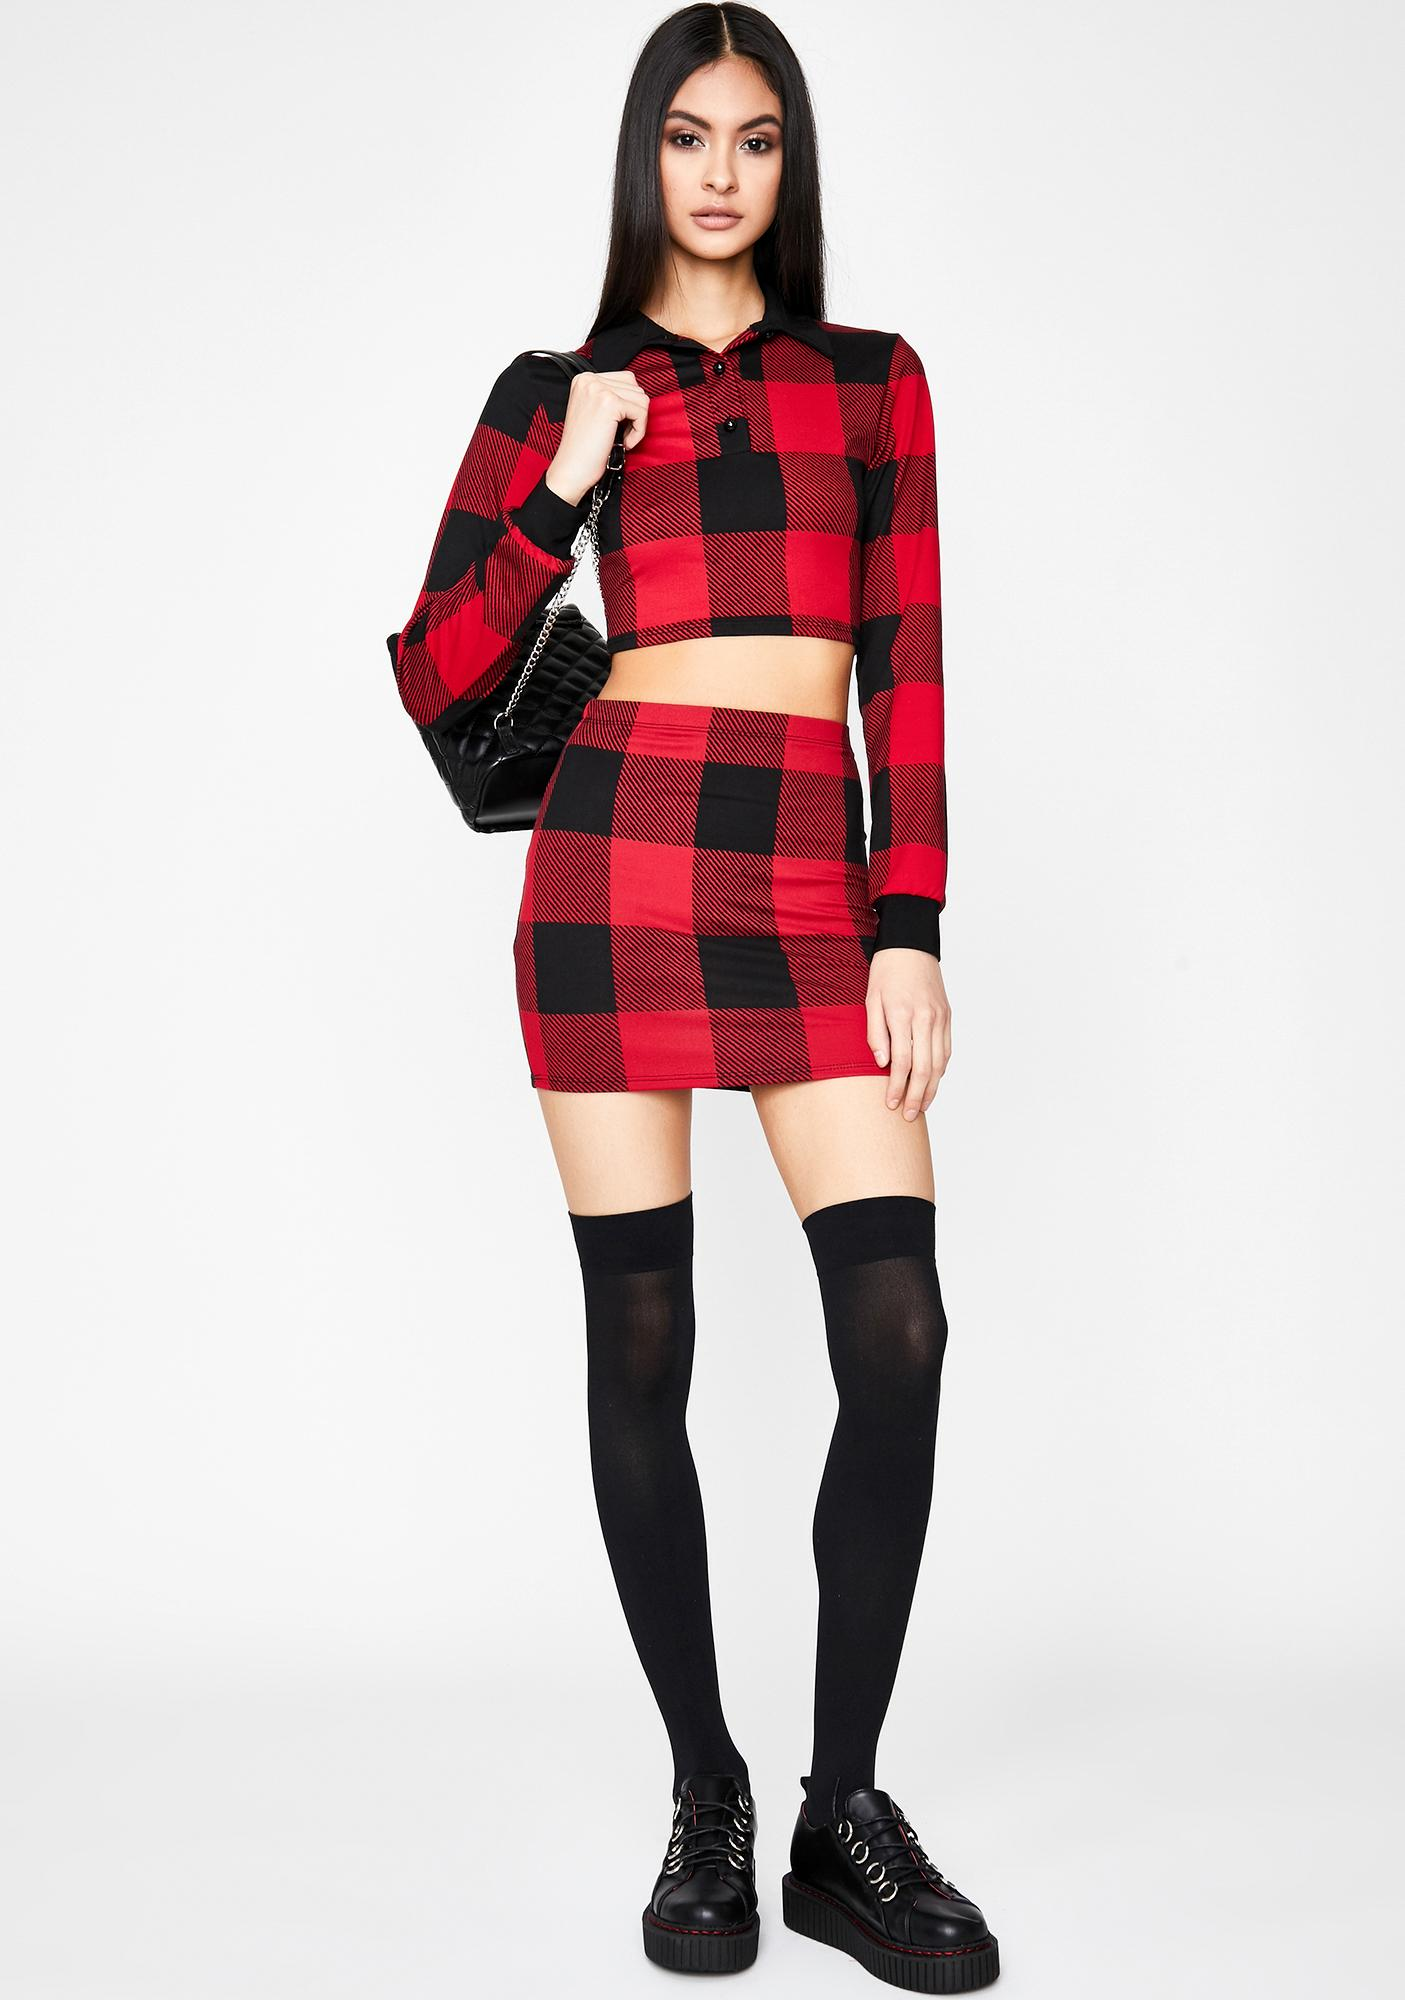 Proper Flex Skirt Set